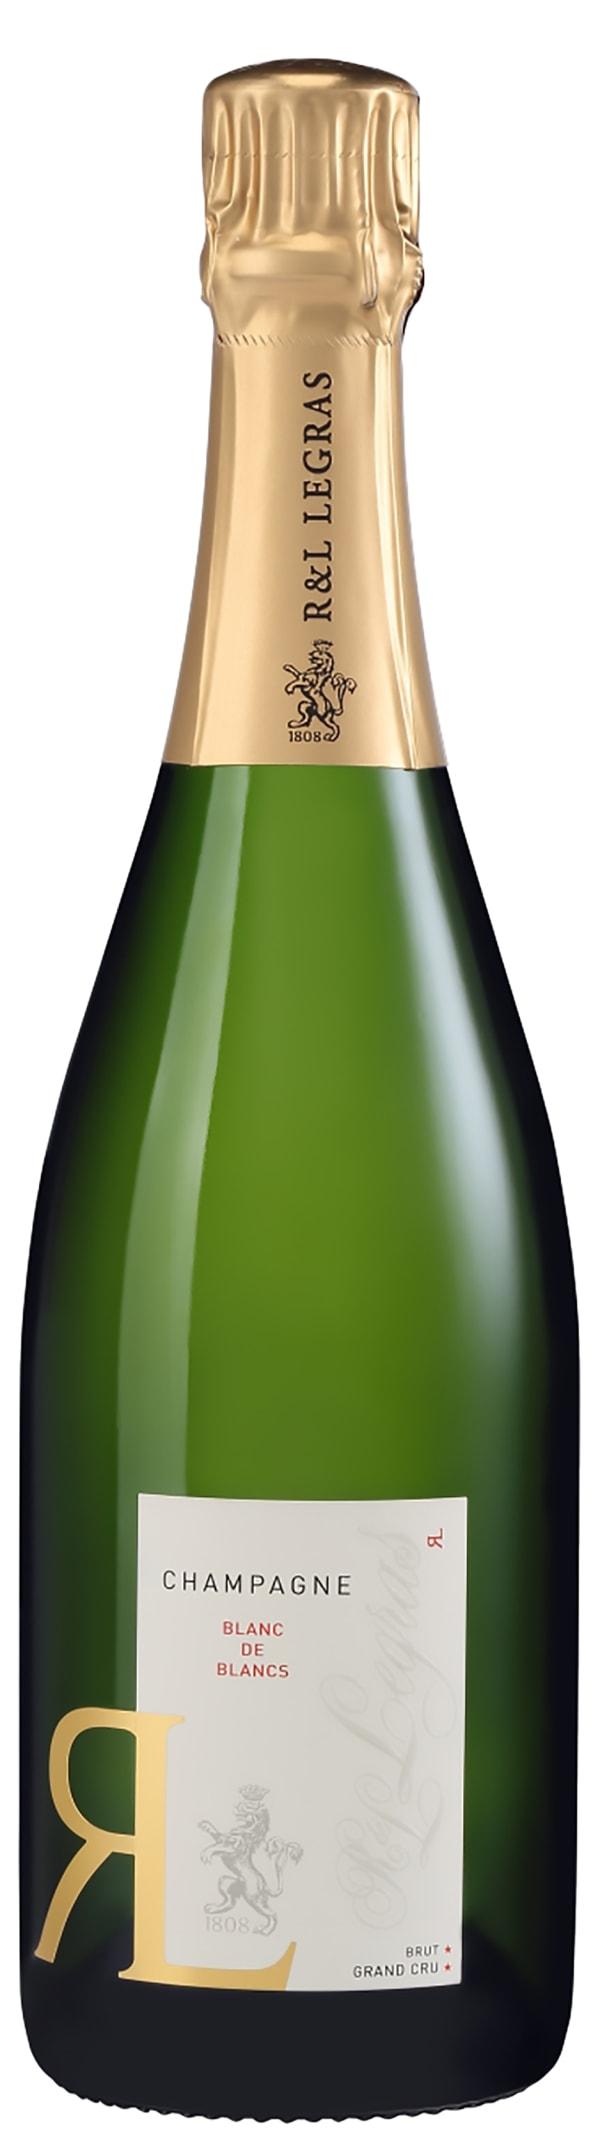 Legras Blanc de Blancs Grand Cru Champagne Brut